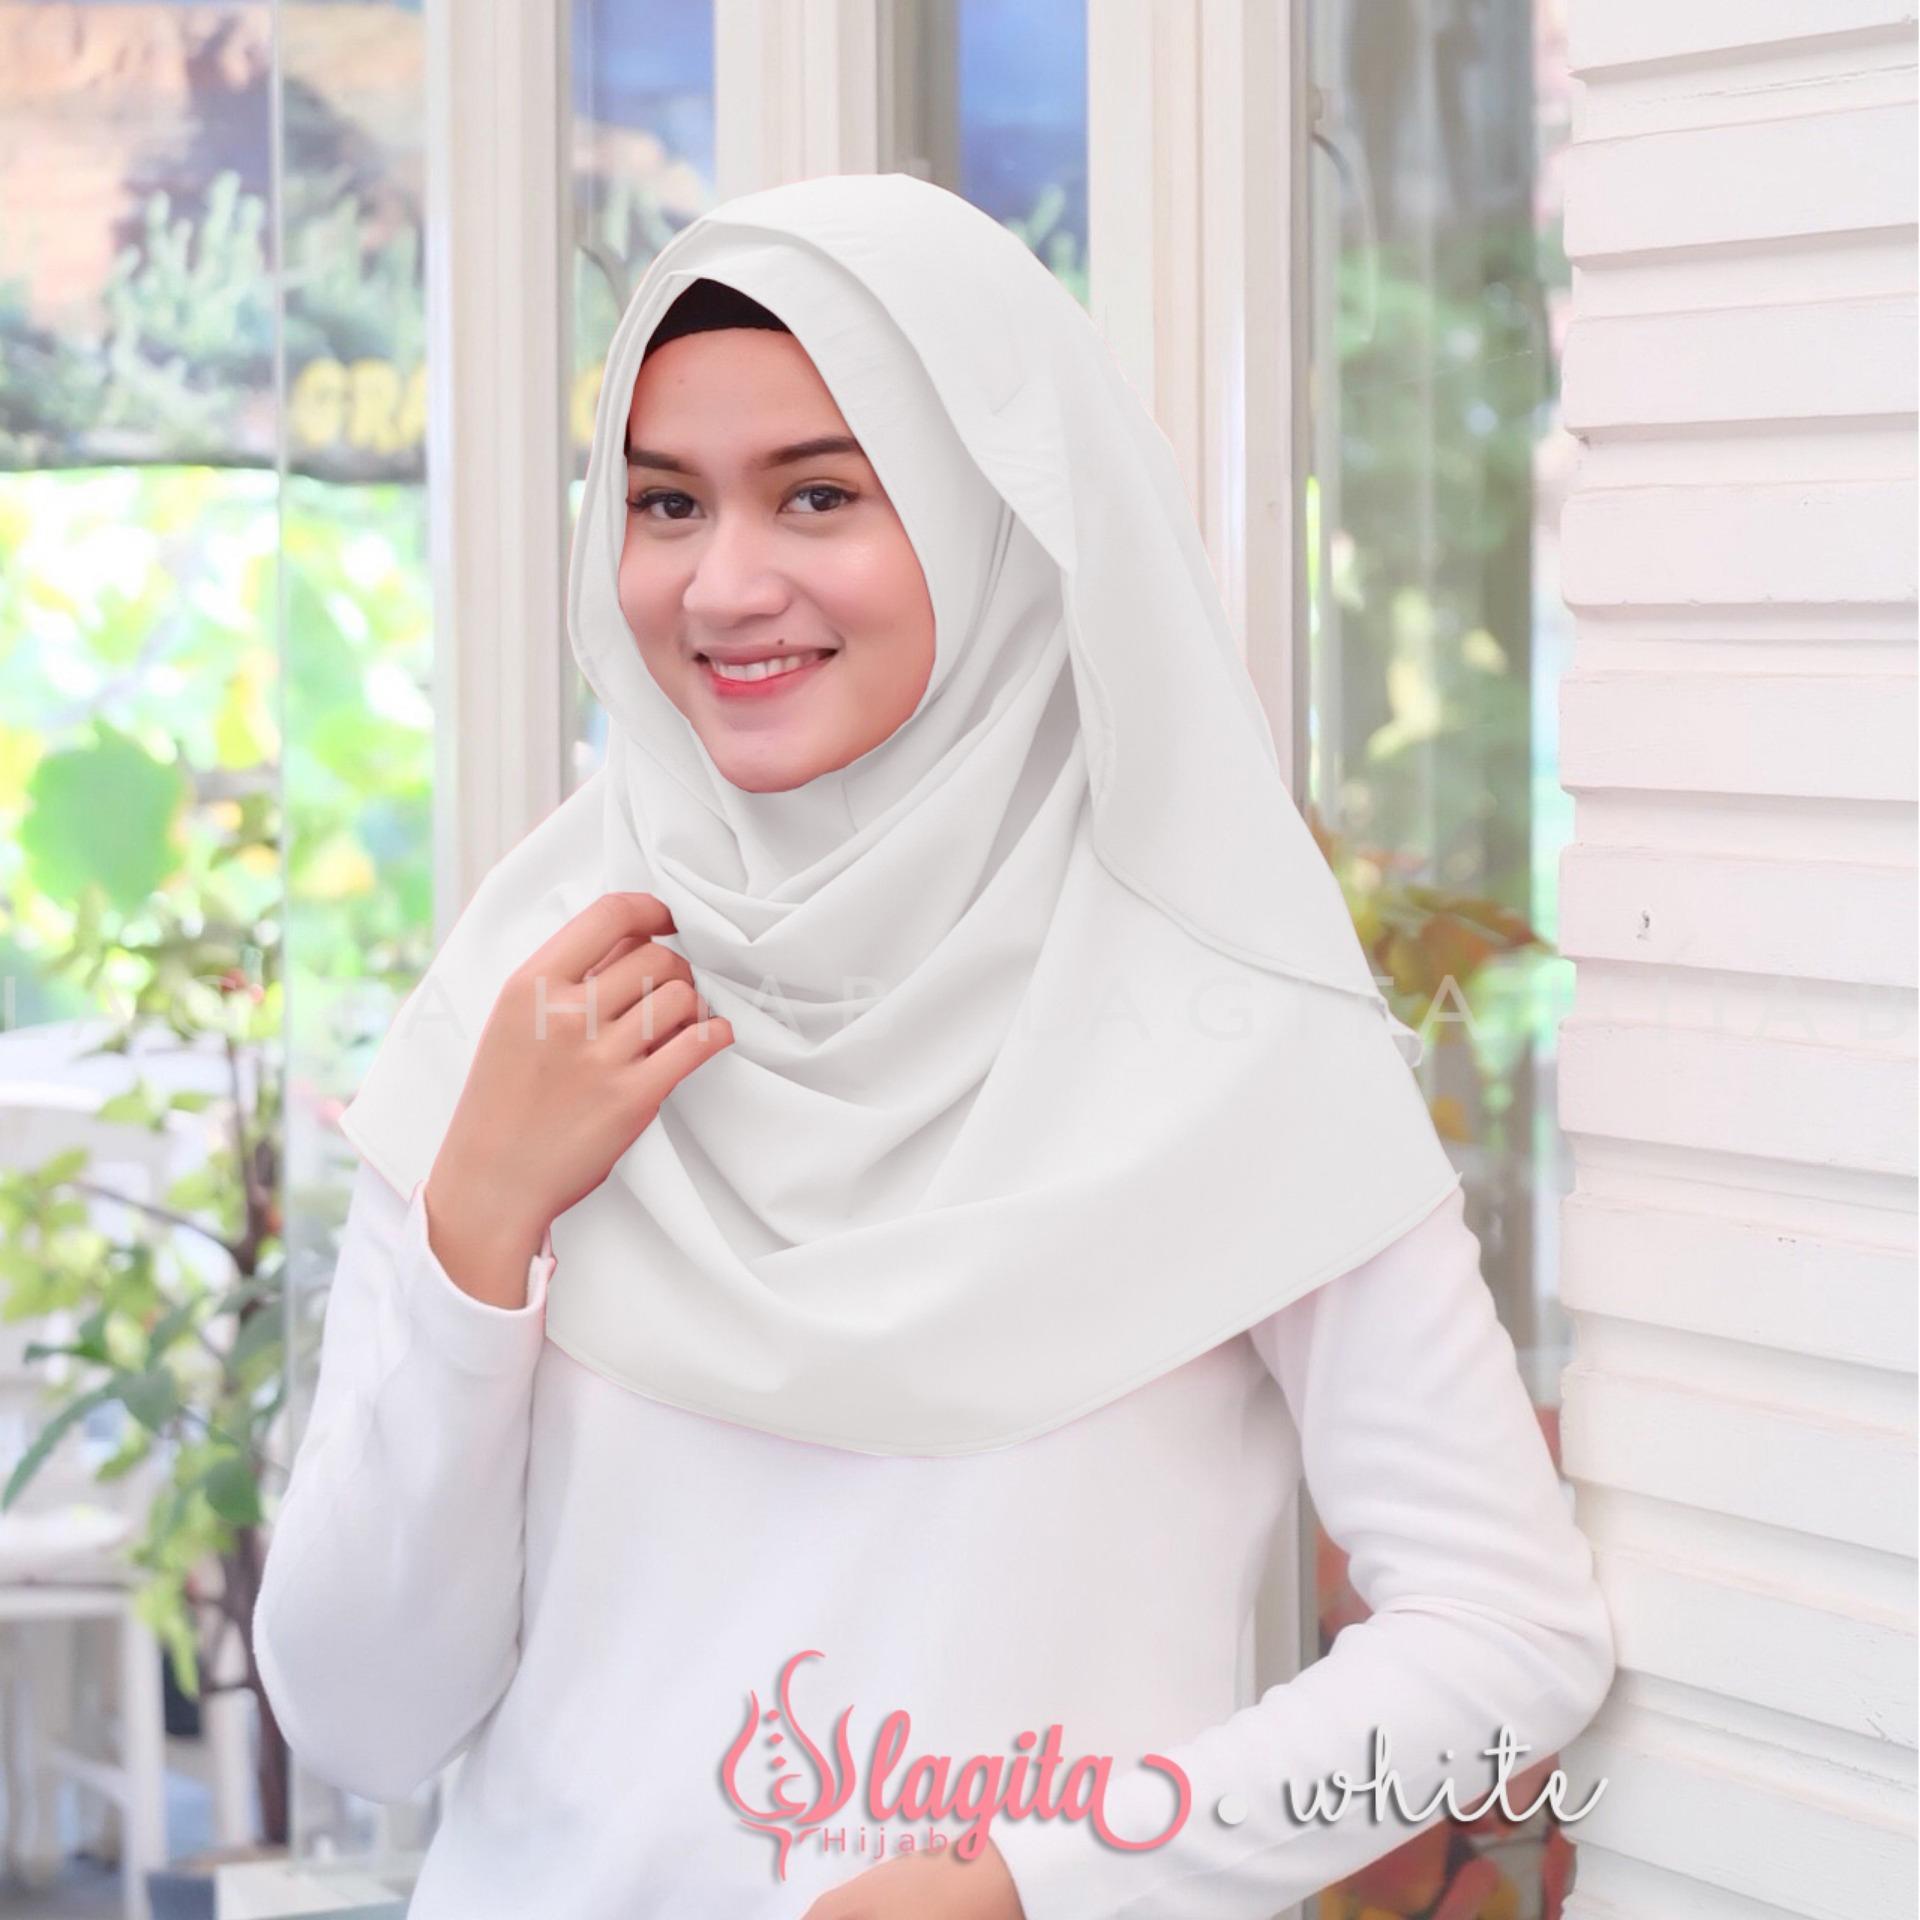 Harga Grosir Termurah Jilbab Adiba Serut Jokowi Hijab Instan Lagita Amora Kerudung White